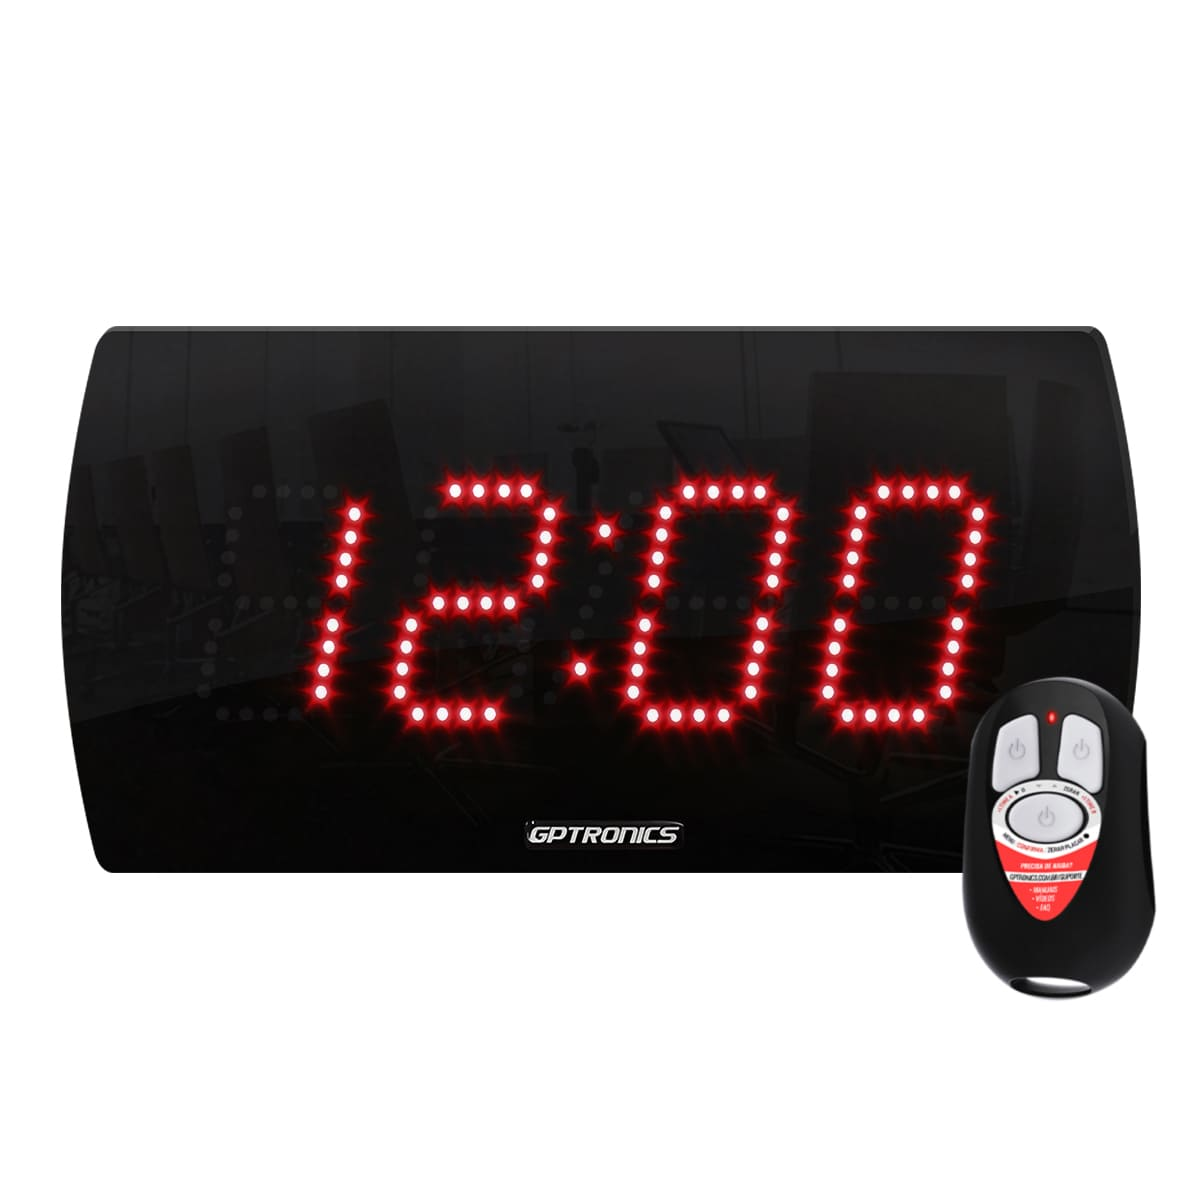 Painel LEDTime 25 - Relógio/Cronômetro Digital - 28x14 cm